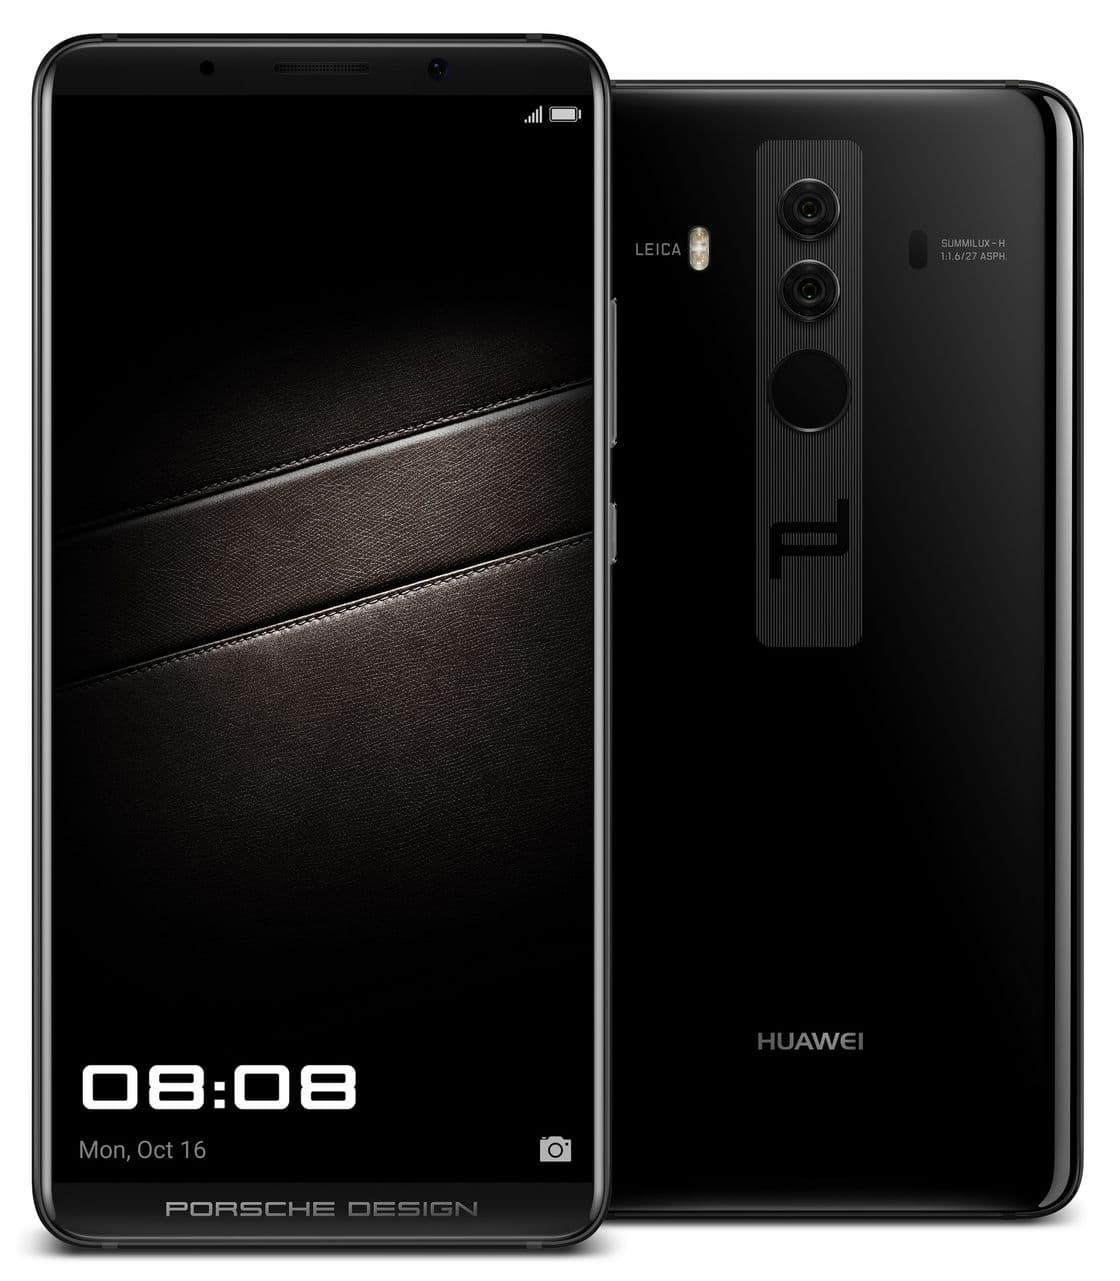 huawei mate 10 porsche design buy smartphone compare. Black Bedroom Furniture Sets. Home Design Ideas